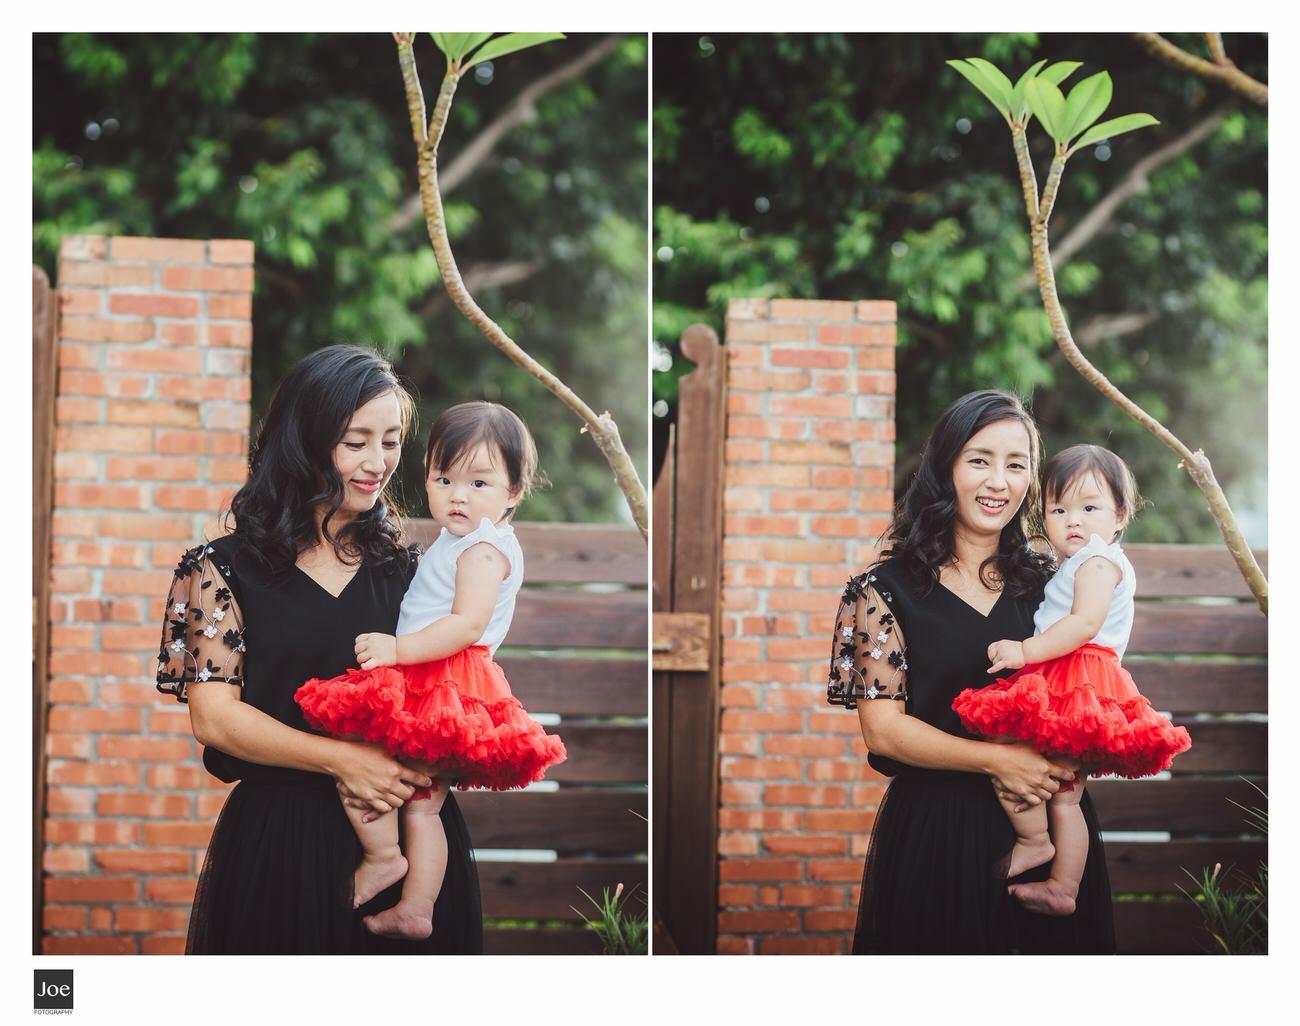 joe-fotography-family-photo-pepper-salt-bowtie-022.jpg